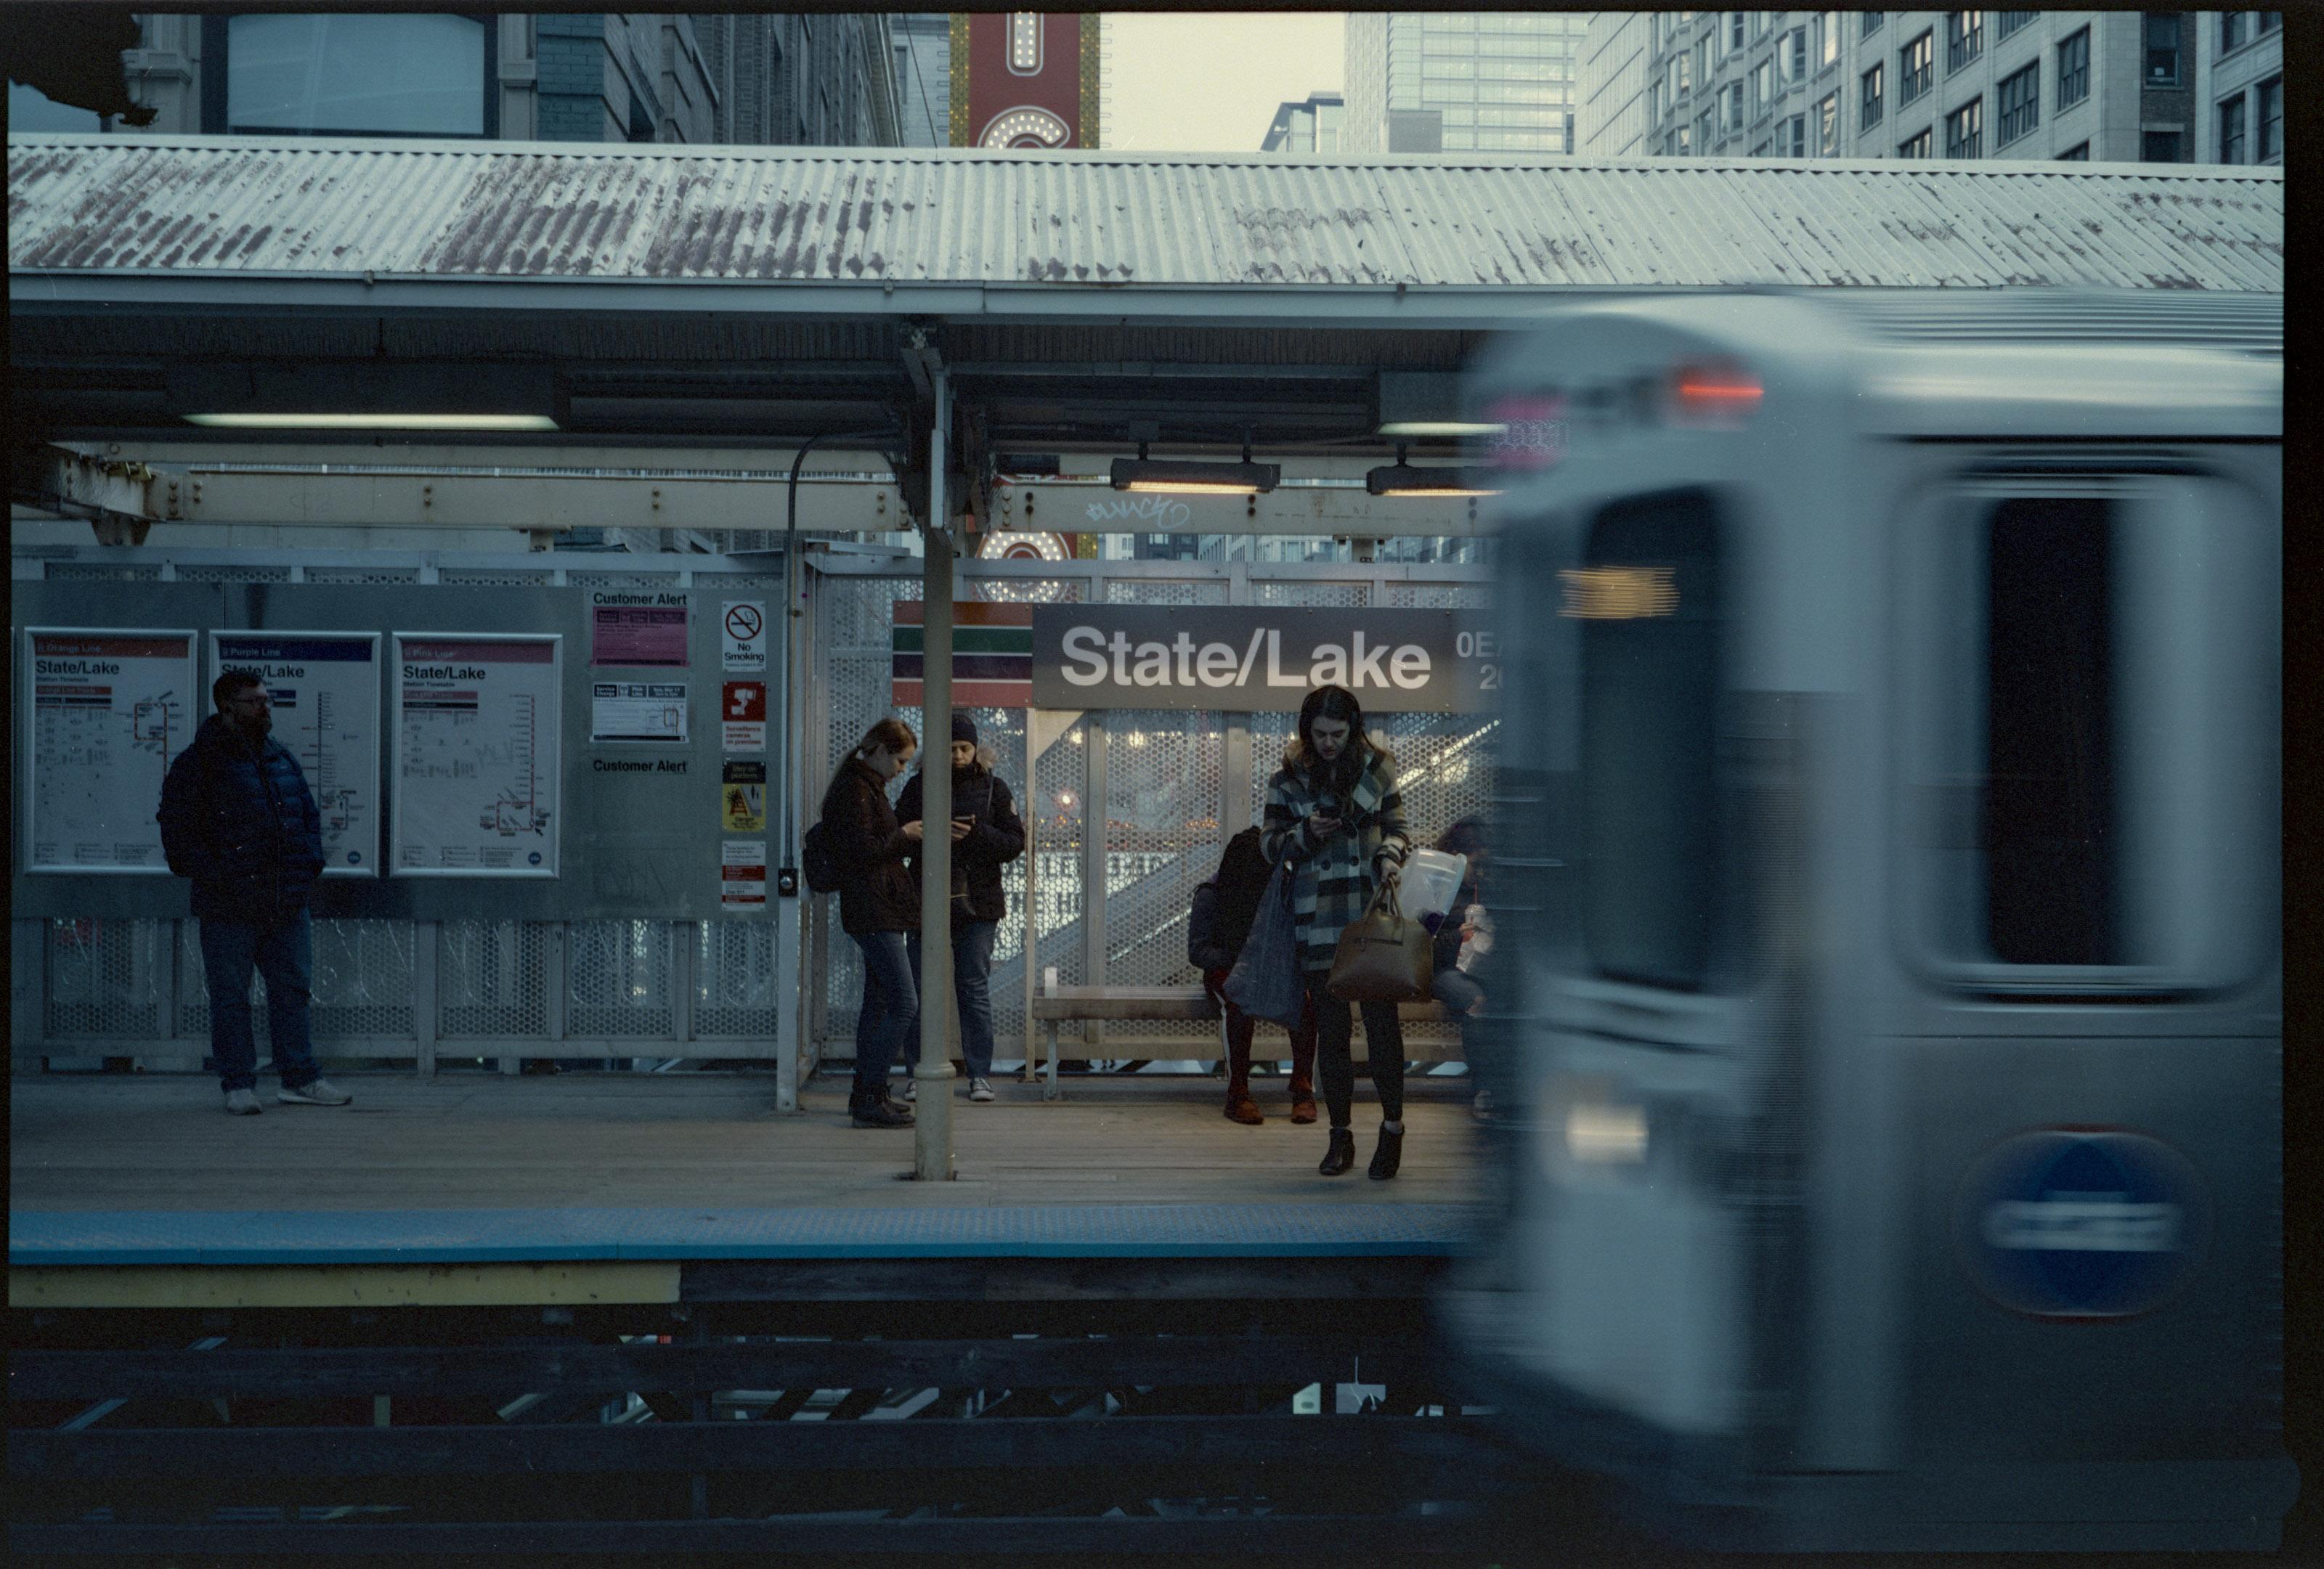 CineStill 800t 120 medium format film shot by Luis Mendoza (@luismendozamx) on the Fuji GW690ii